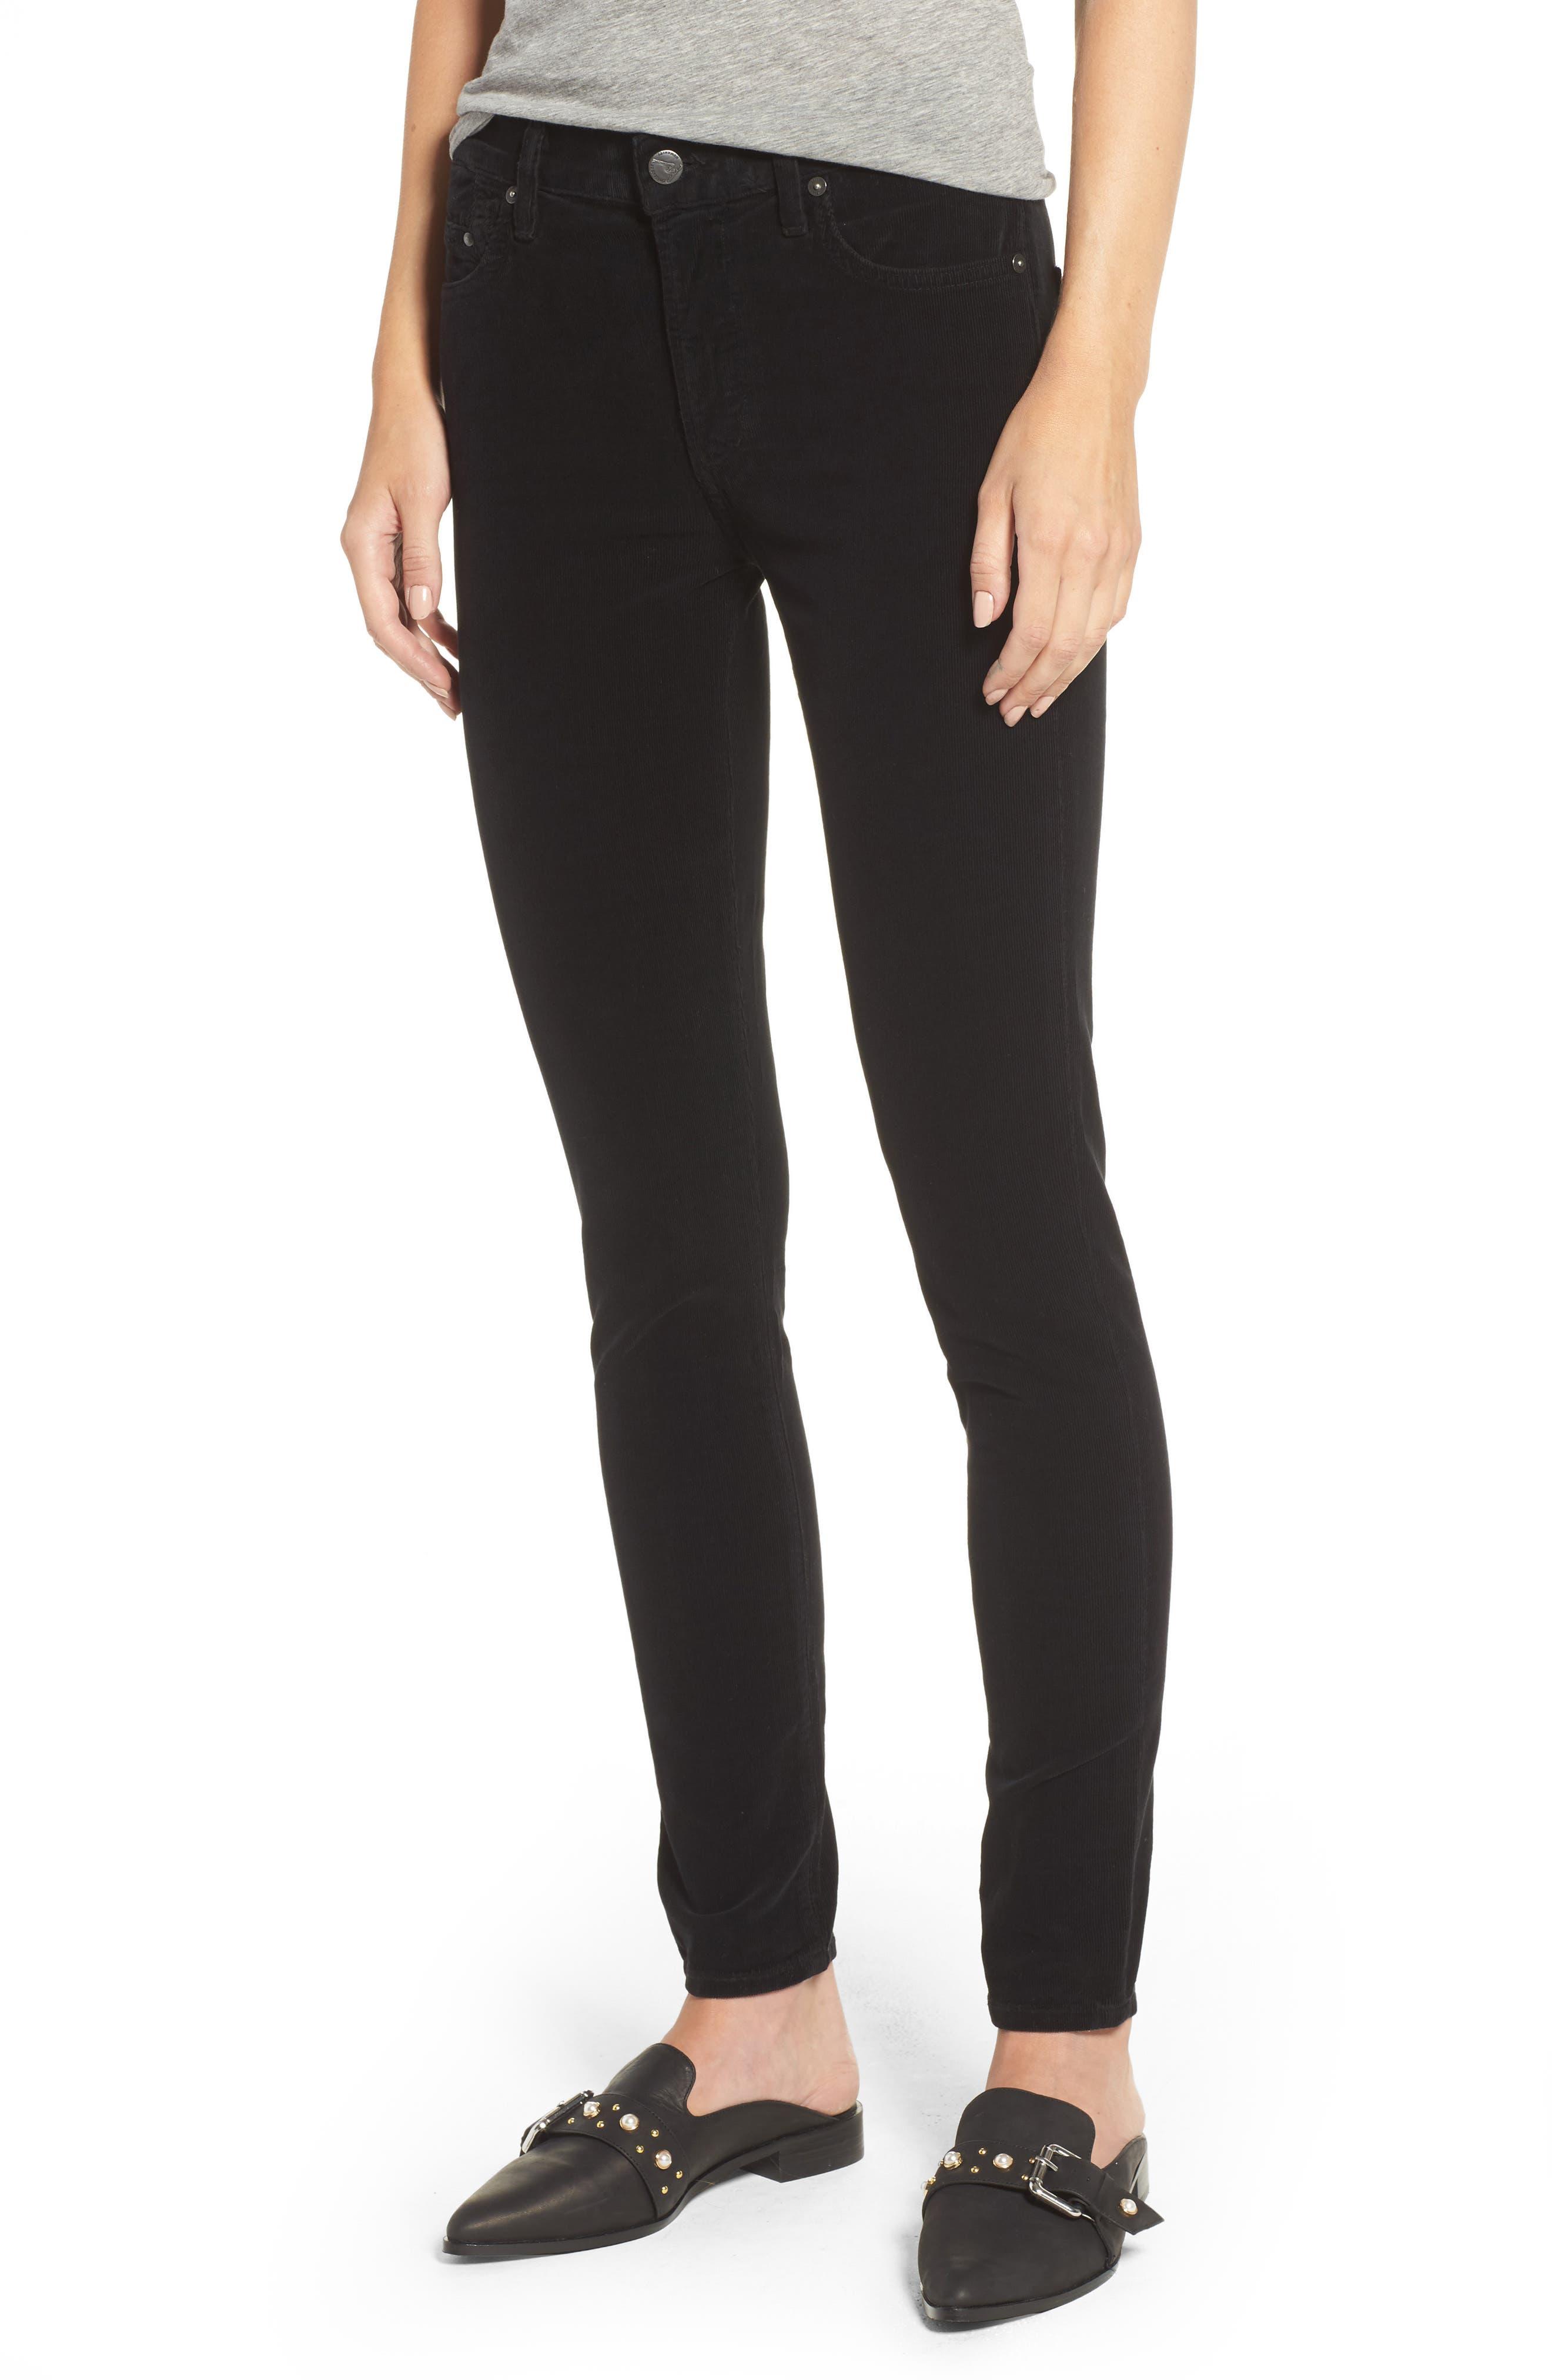 Rocket High Waist Skinny Corduroy Pants,                         Main,                         color, Black Cord